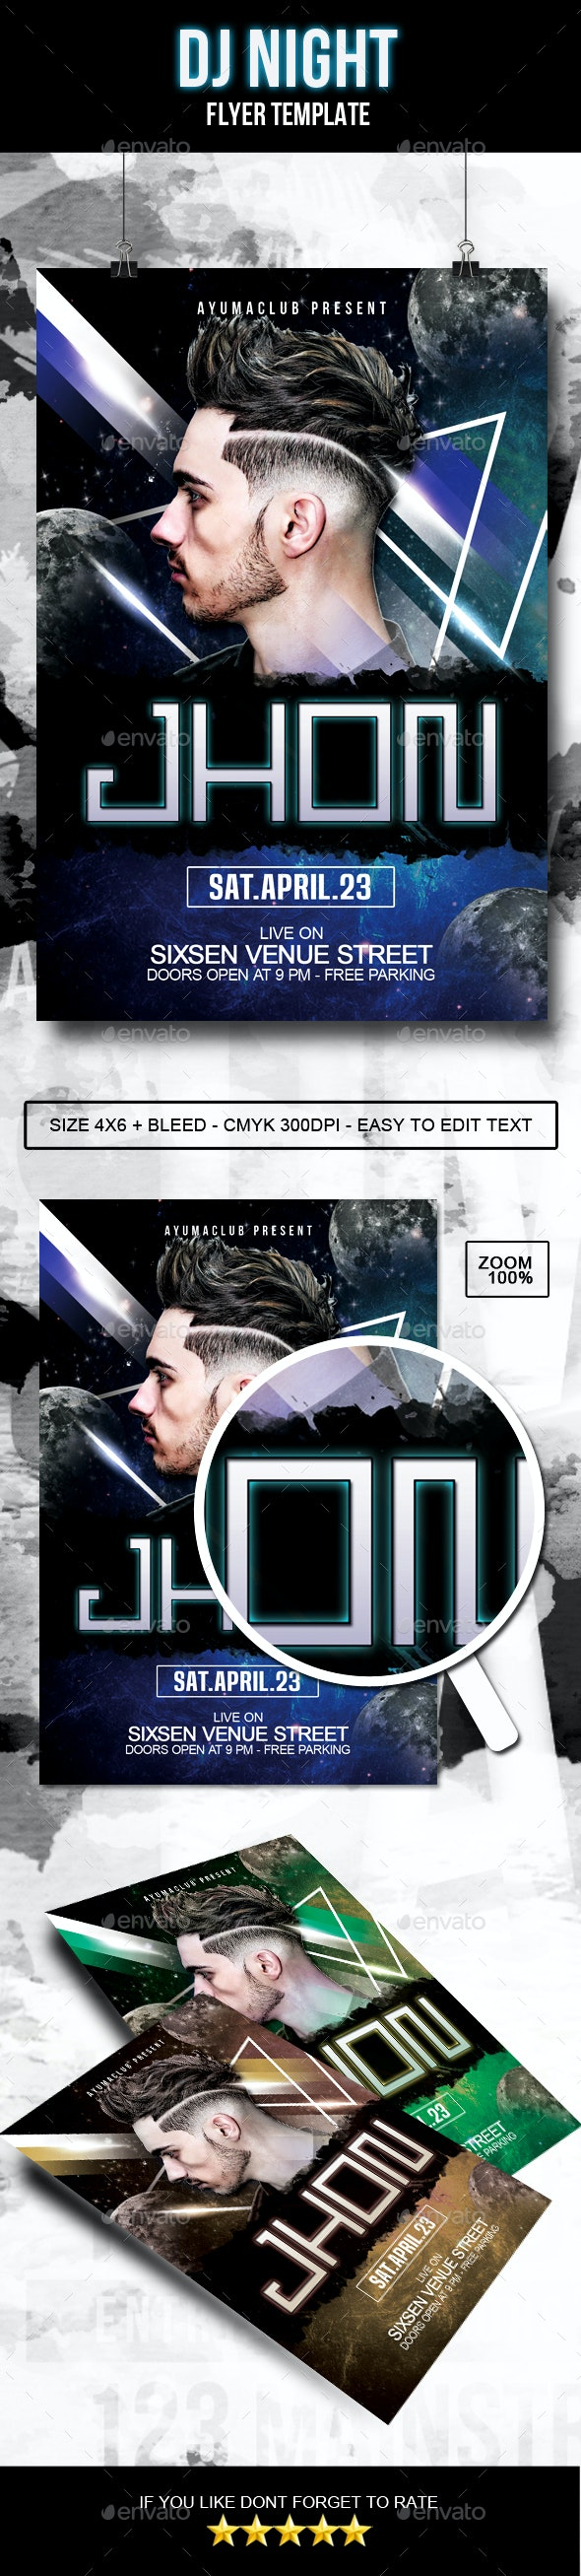 DJ Night Flyer - Clubs & Parties Events